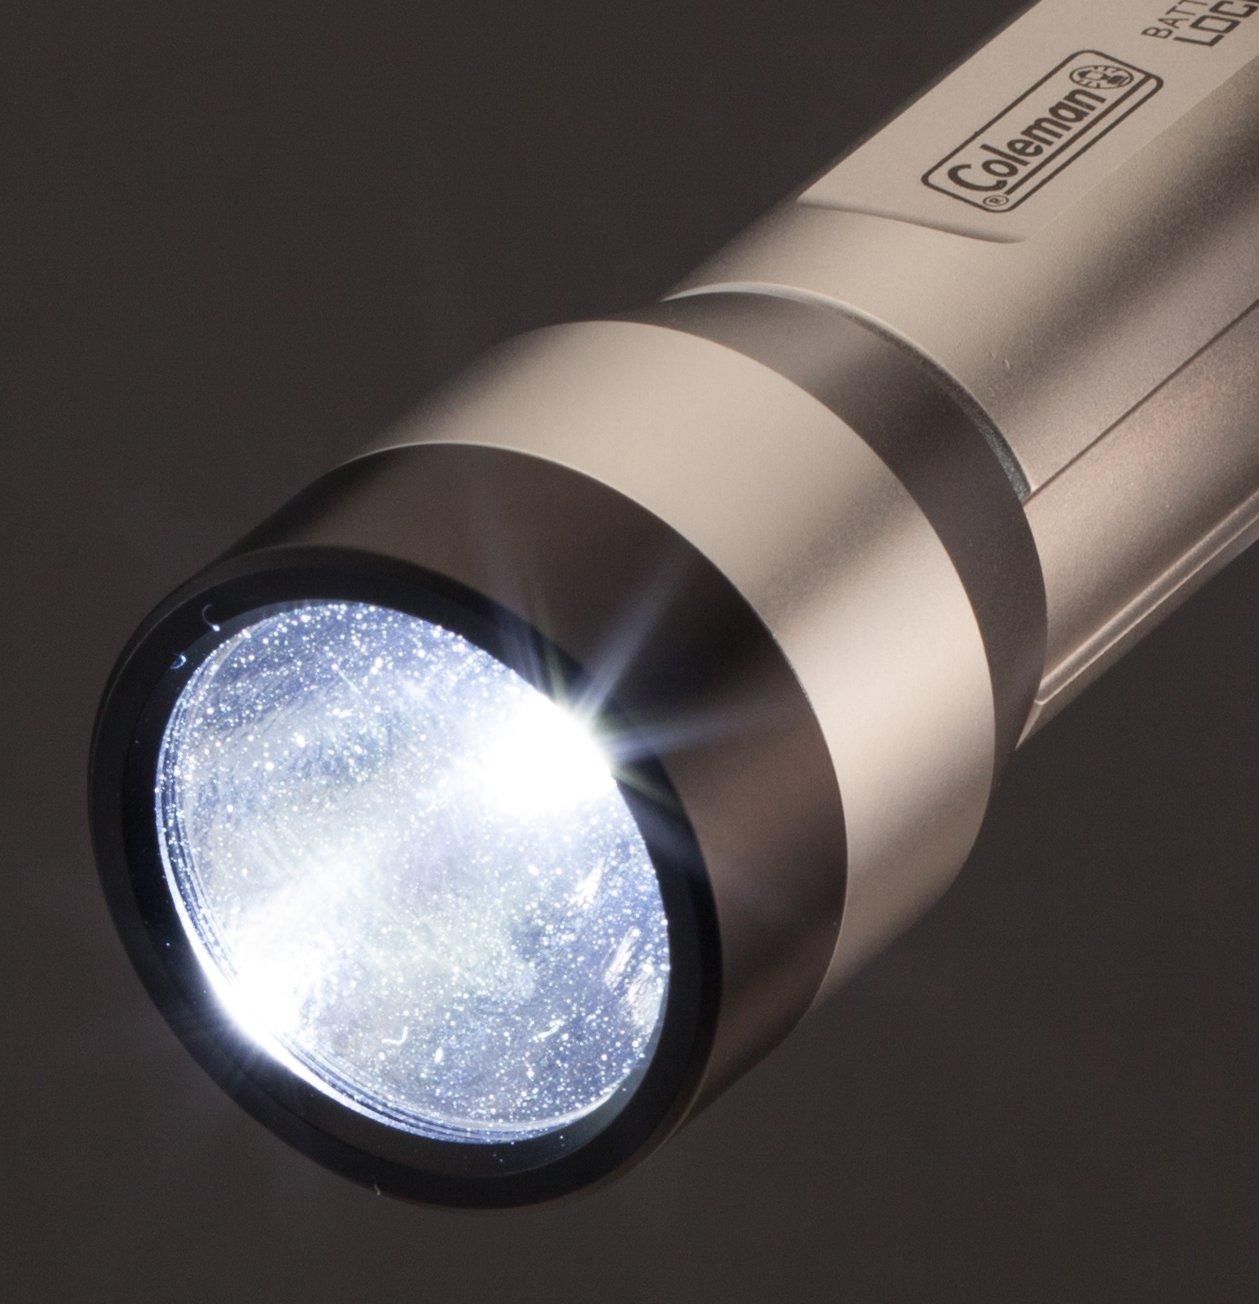 Coleman (Coleman) Light battery lock flash light / 100 2000022293 by Coleman (Coleman) (Image #4)